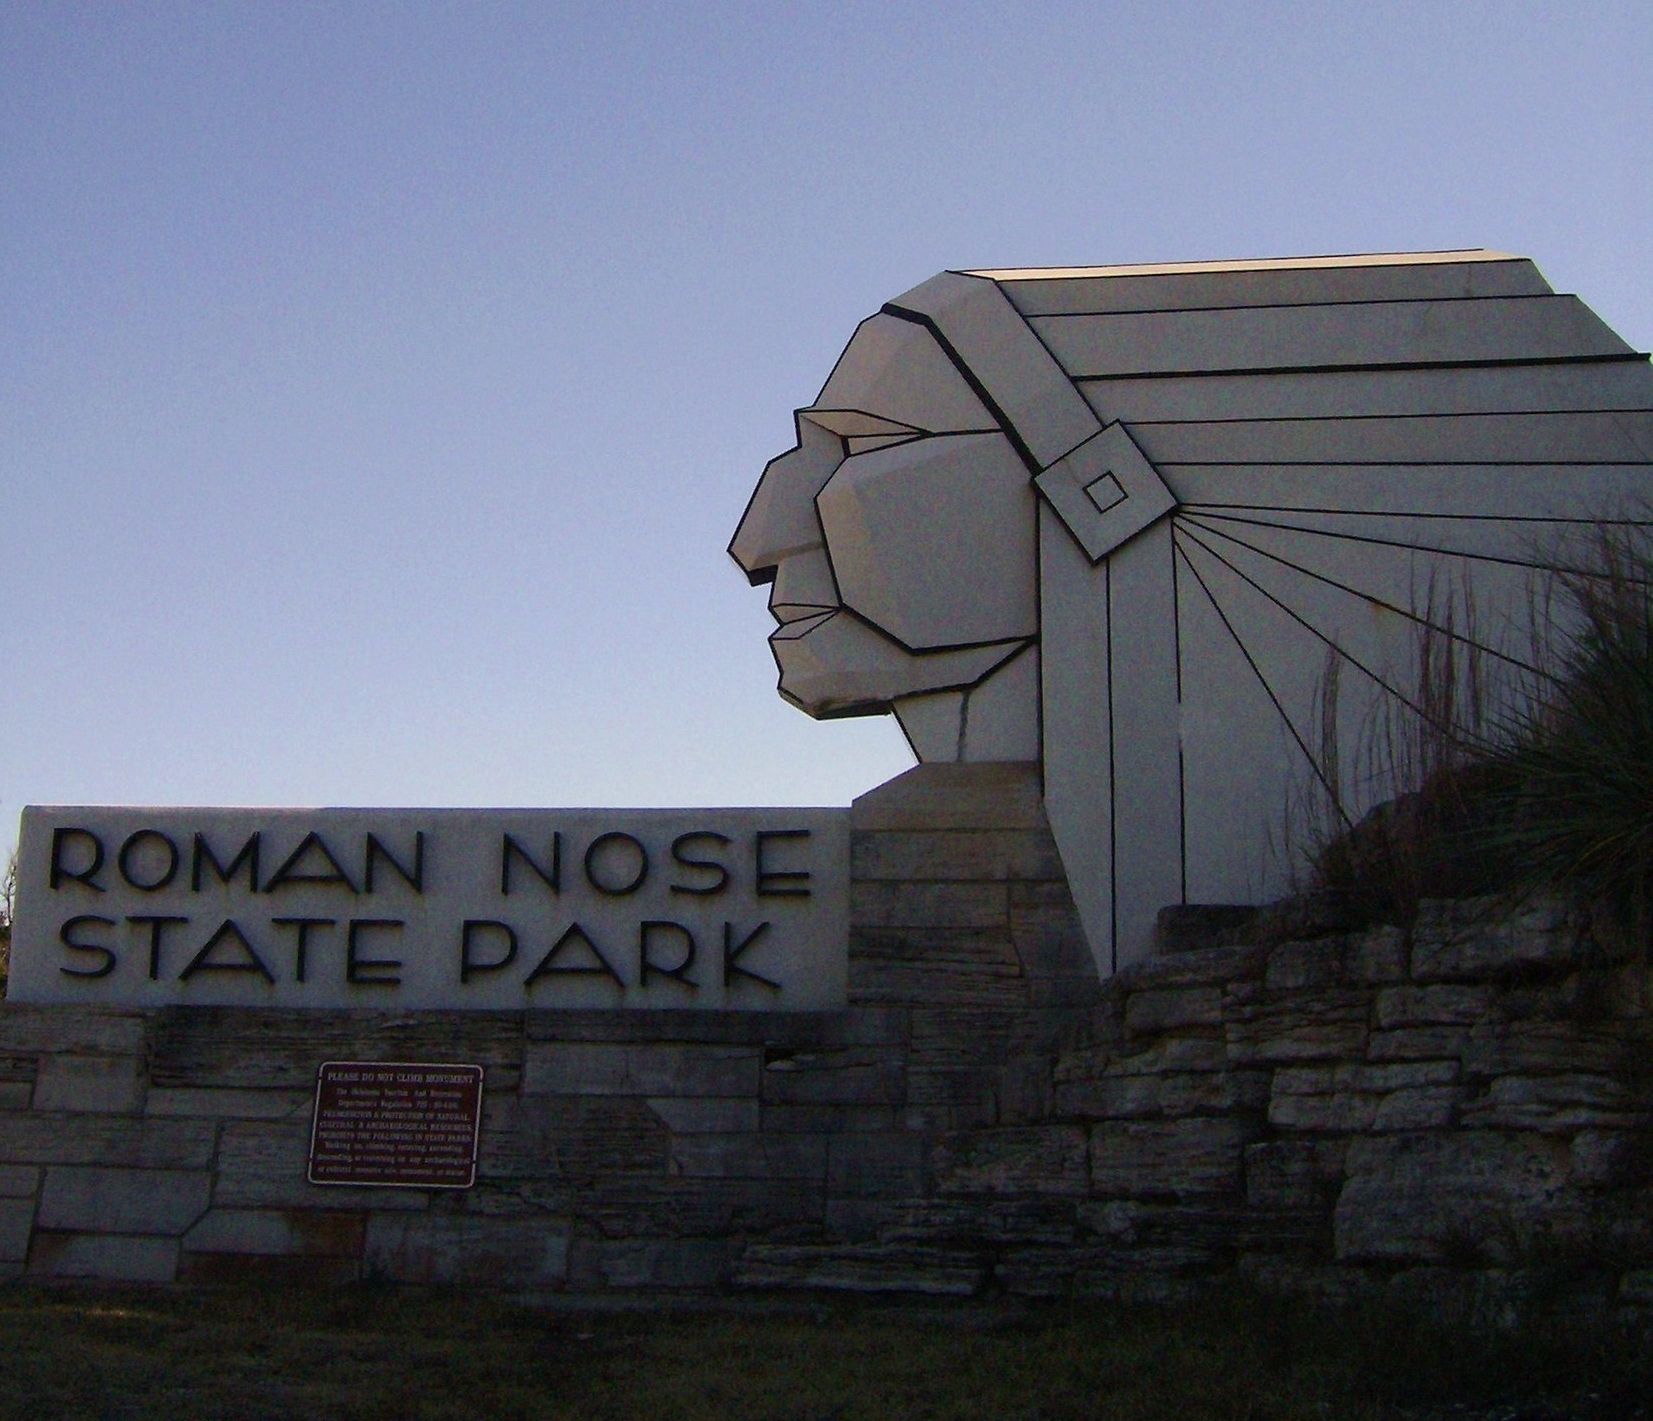 Roman Nose State Park in Watonga, OK